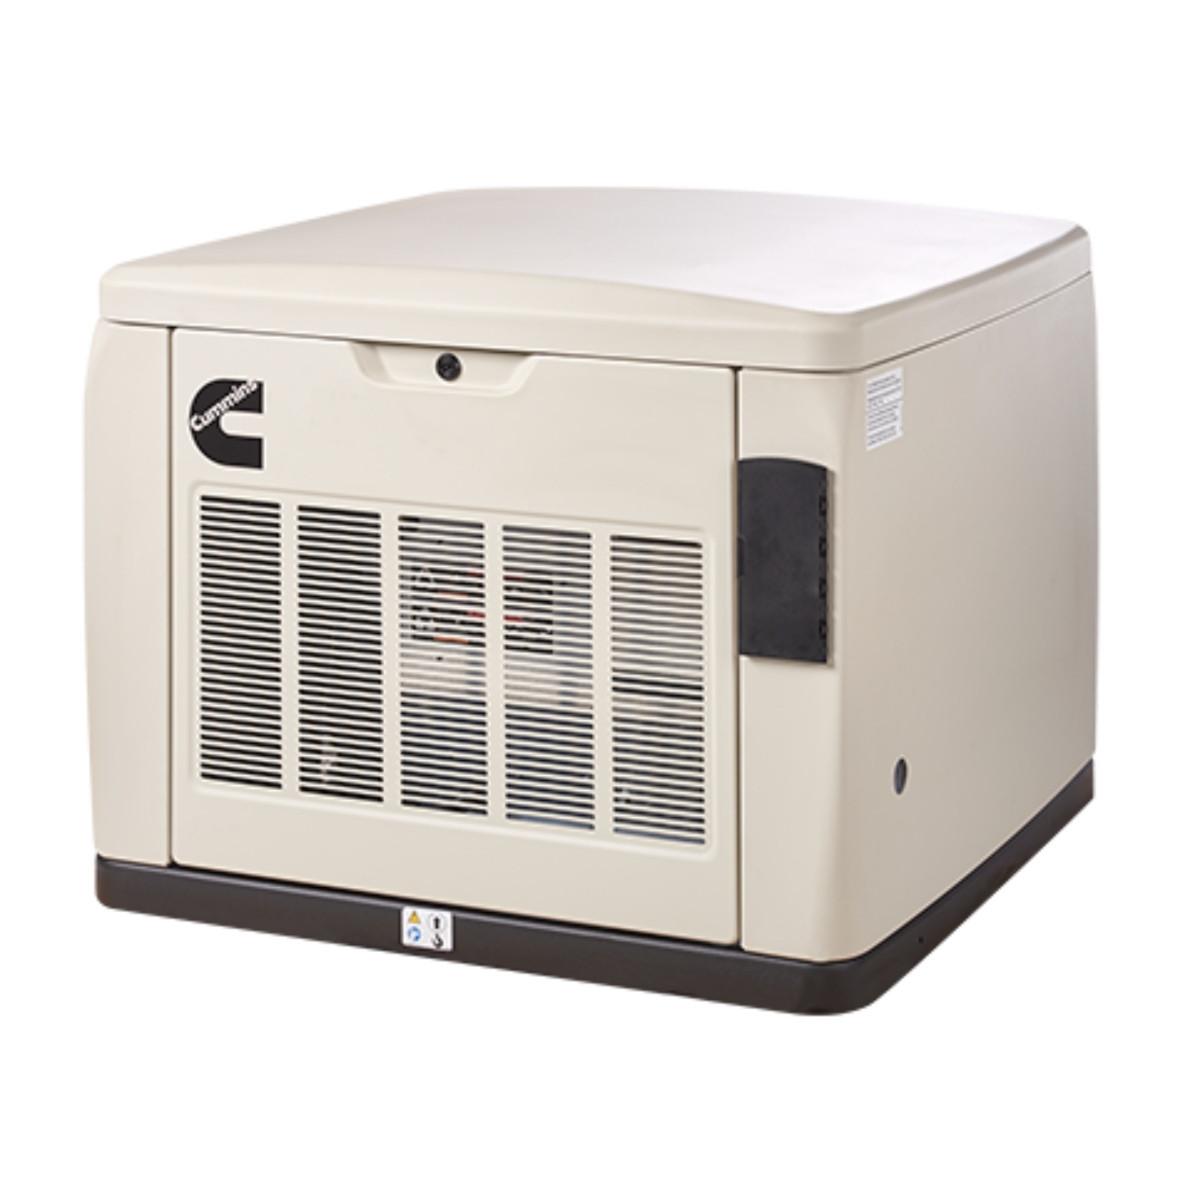 medium resolution of cummins rs17a 17kw quiet connect series cummins power generation generator